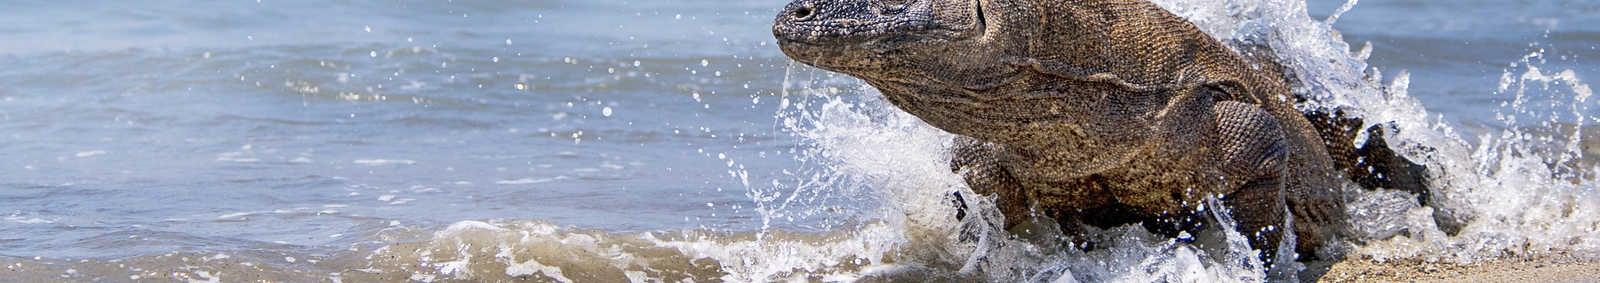 Komodo Dragon, Indonesia